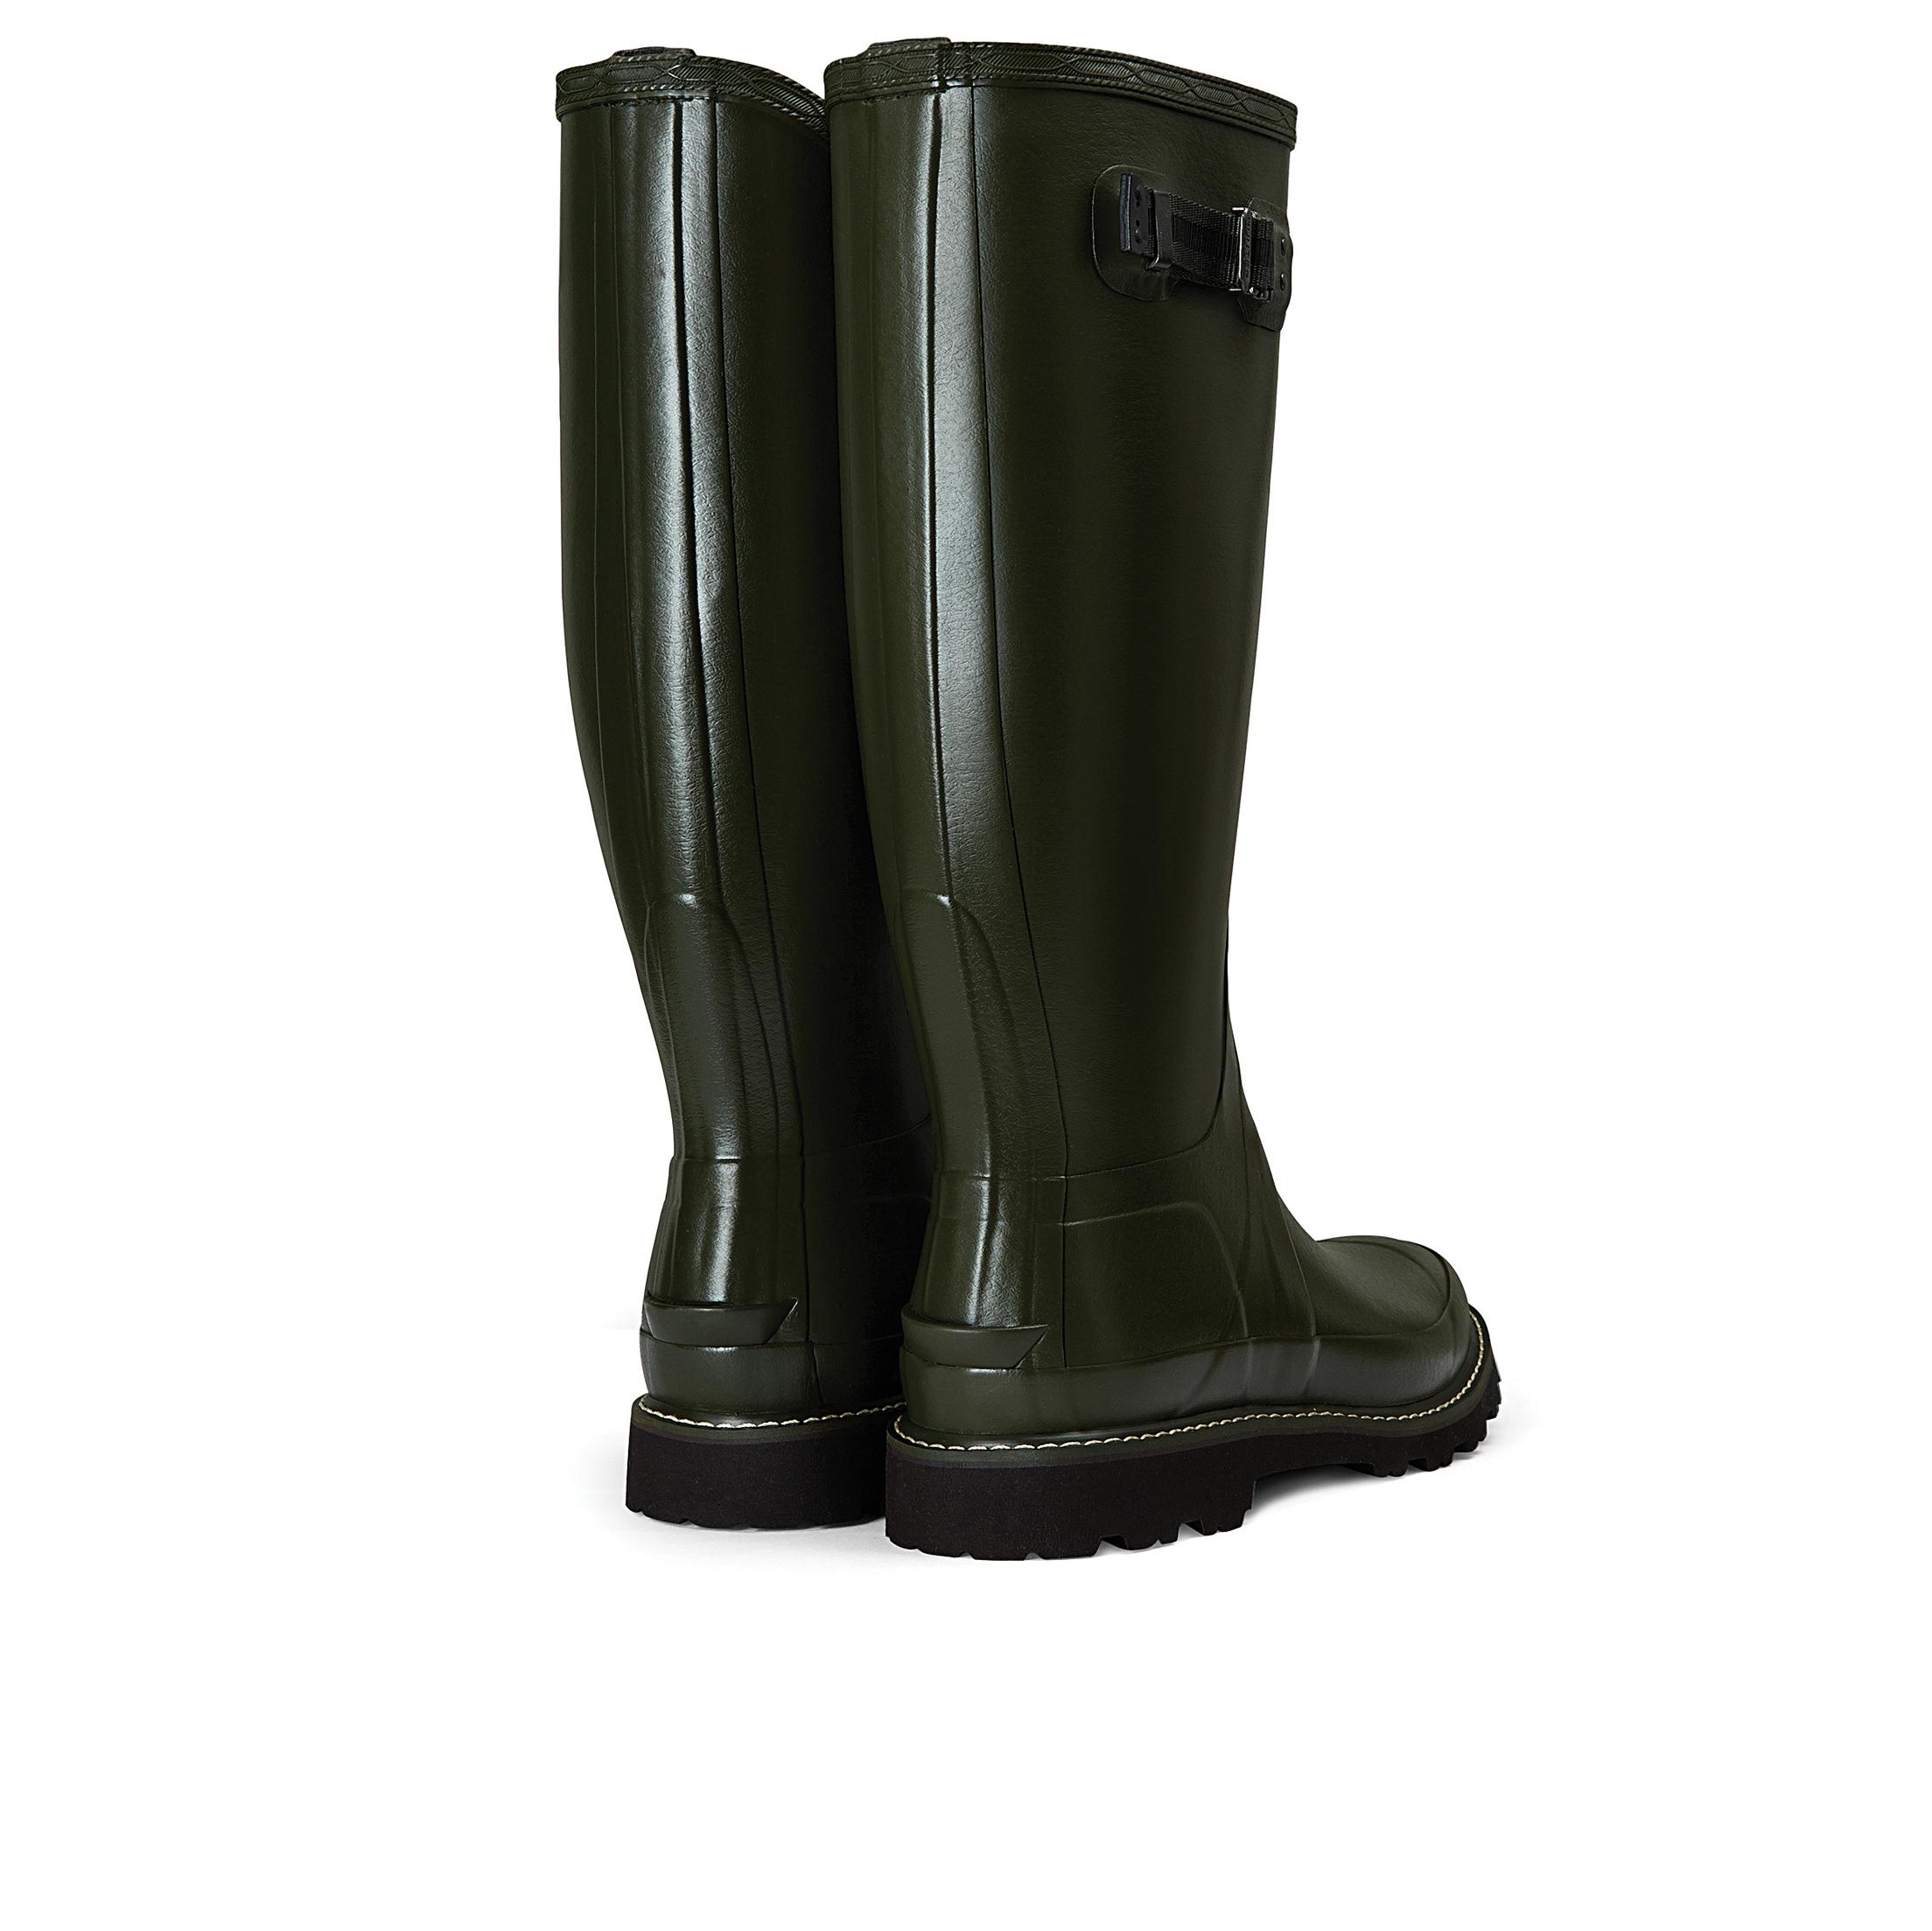 Stivali di Gomma Uomo Hunter Balmoral II Dark Olive in